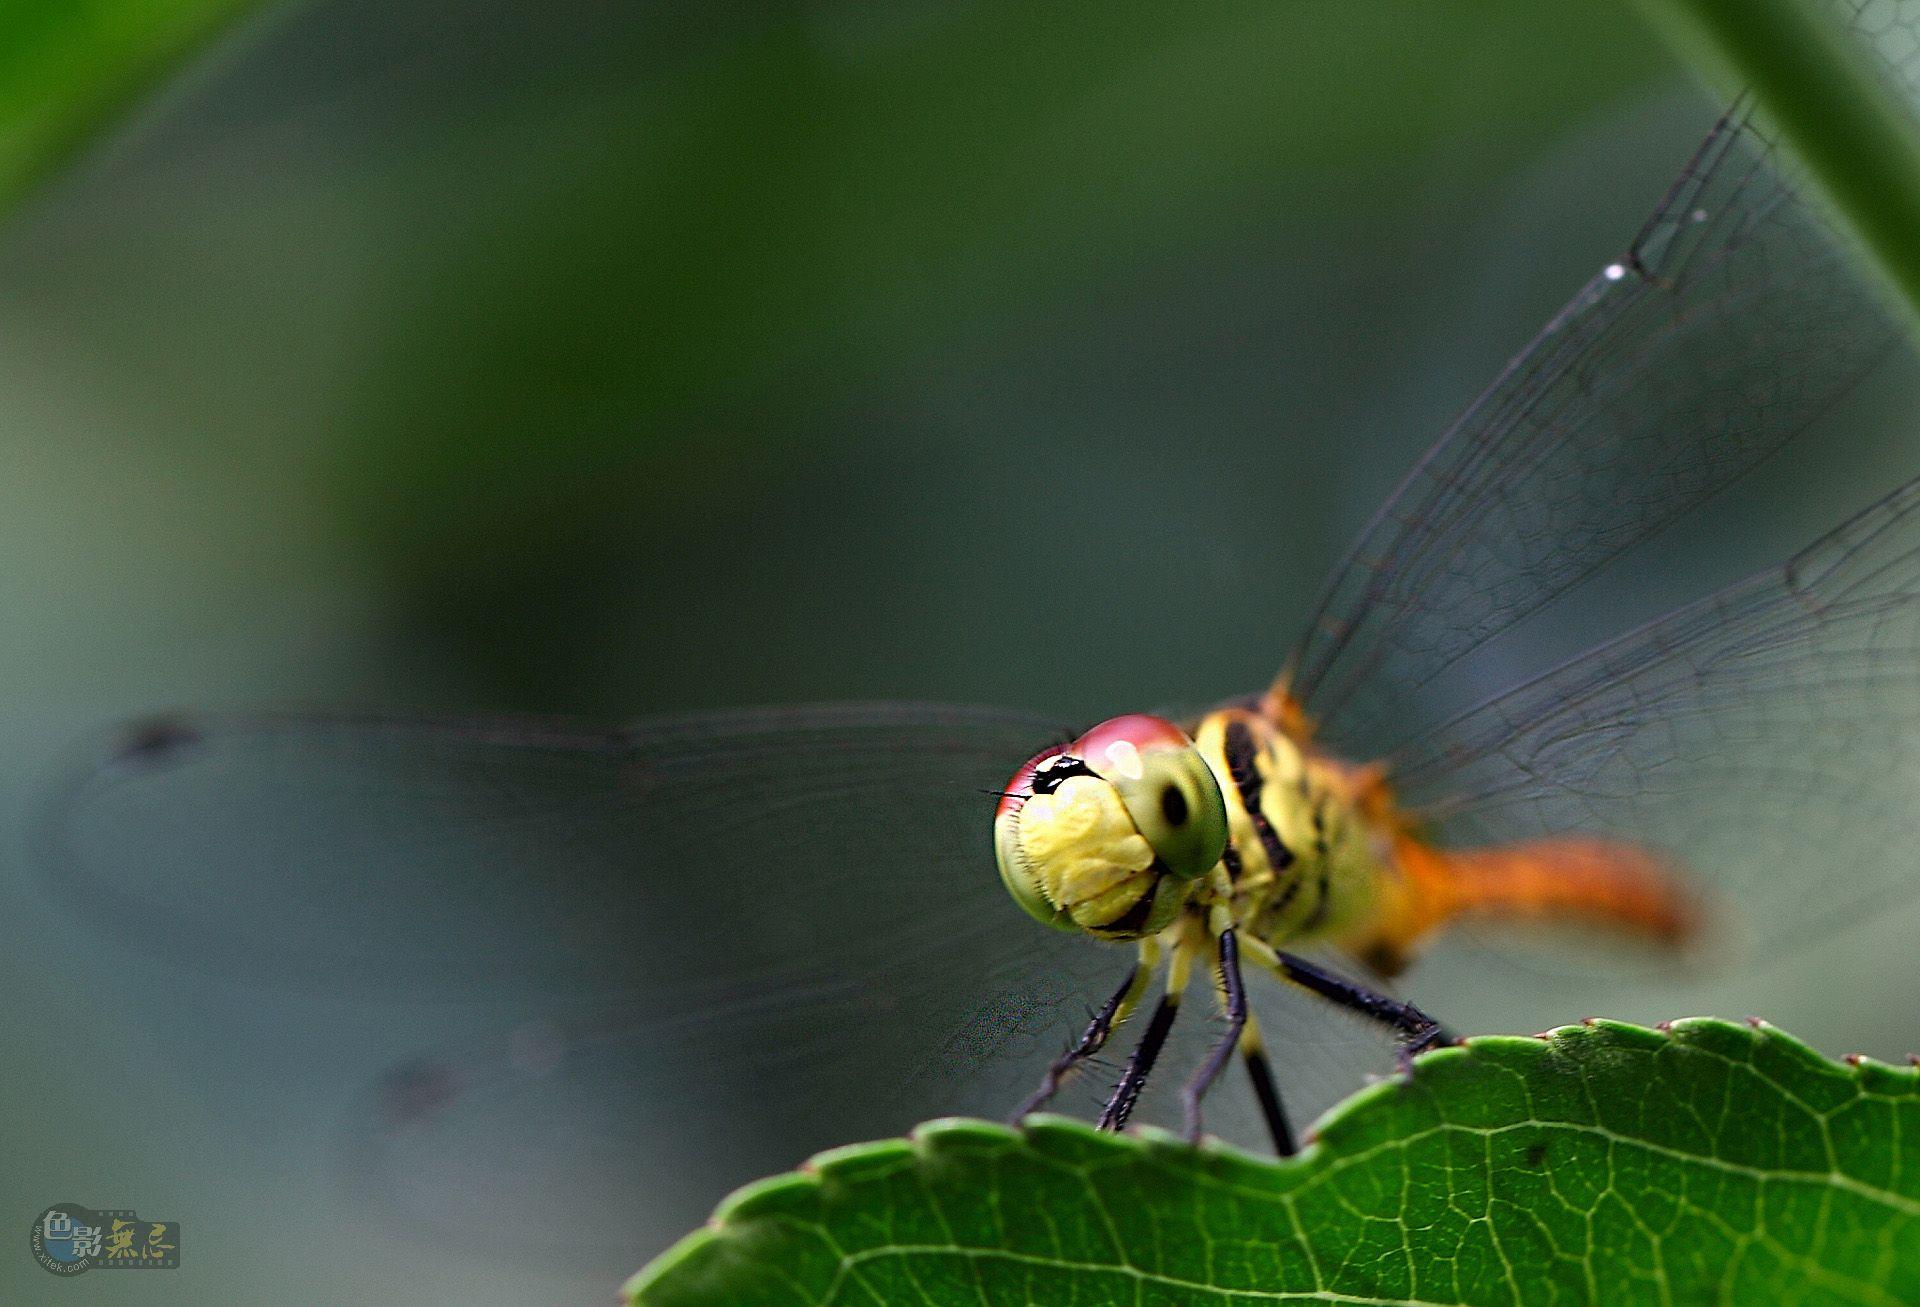 zhaoal作品:蜻蜓